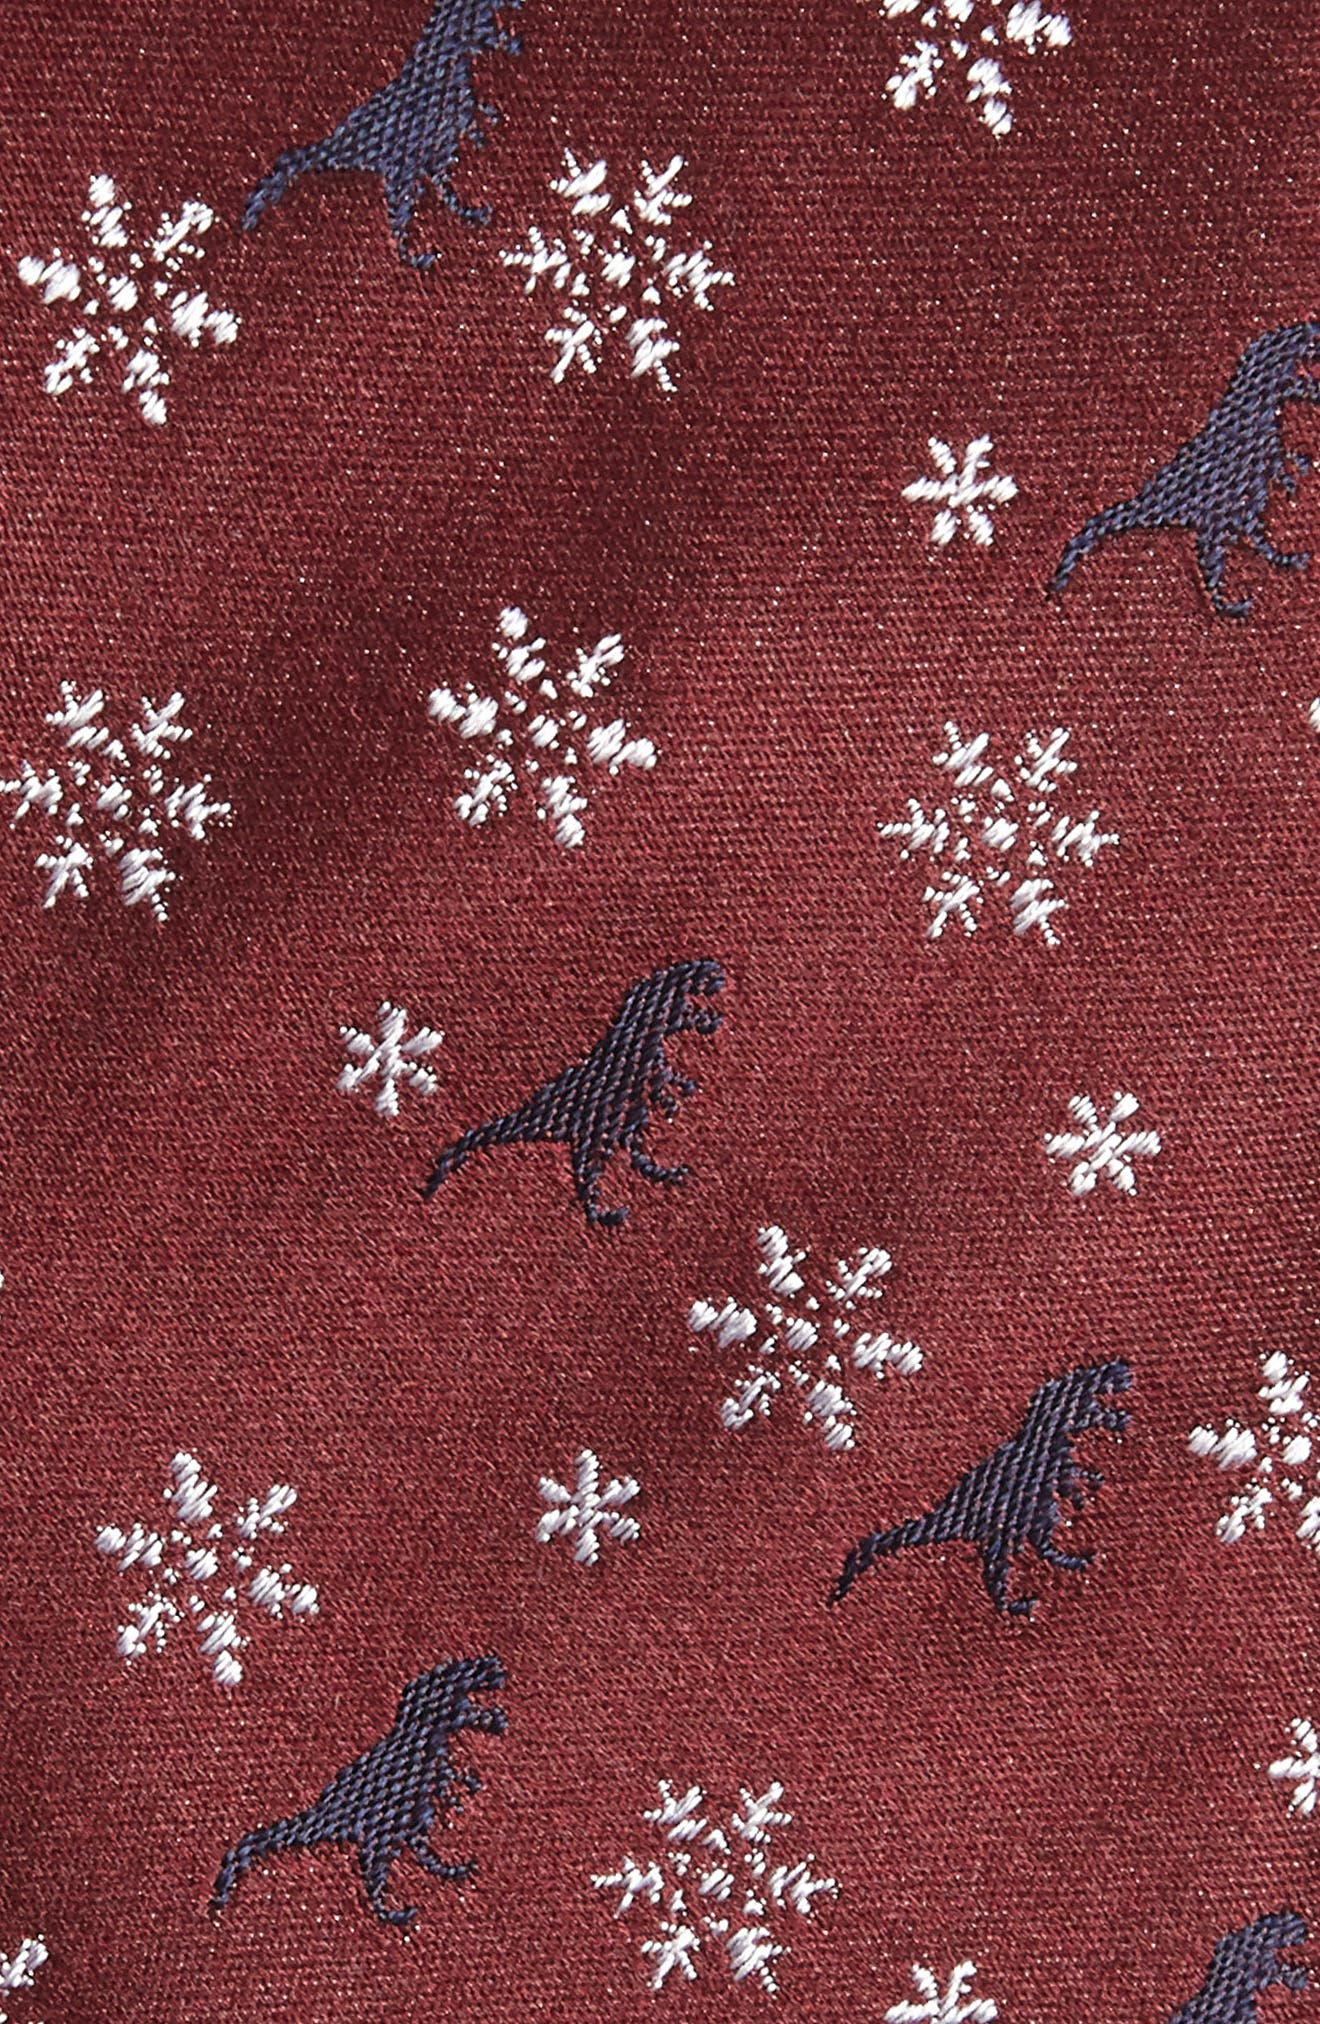 Dino Holiday Silk Tie,                             Alternate thumbnail 2, color,                             BURGUNDY